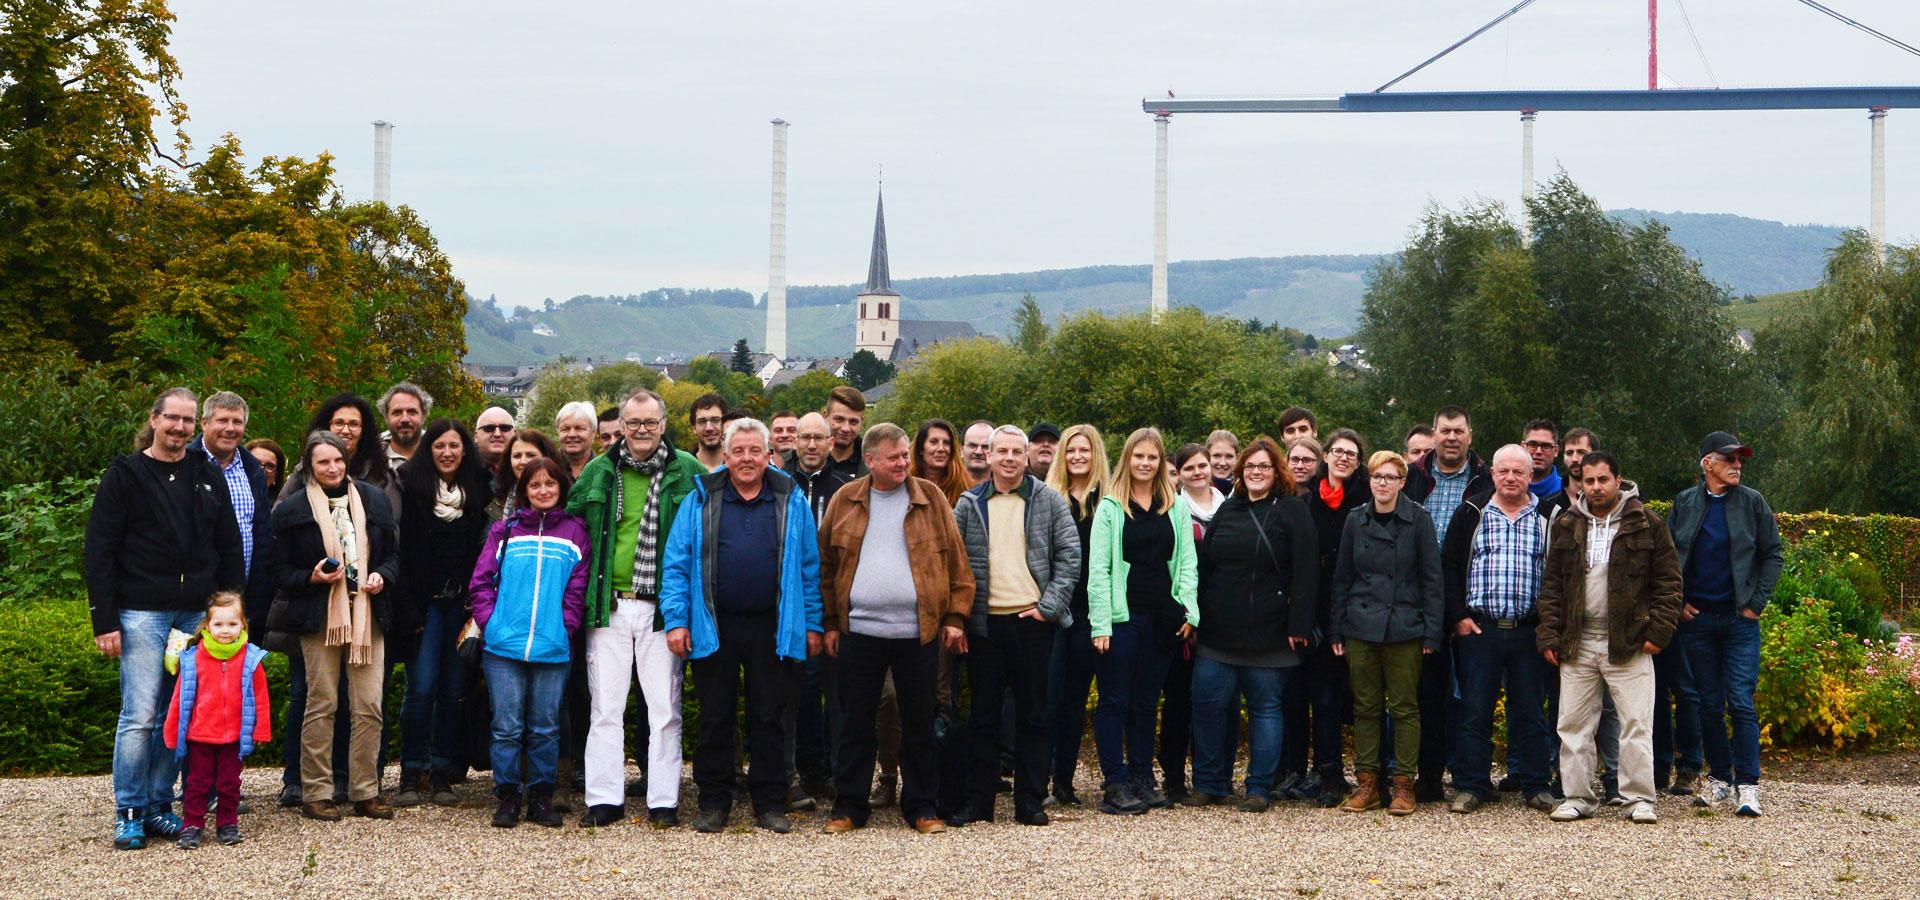 Betriebsausflug - Ochs Holzbau Team